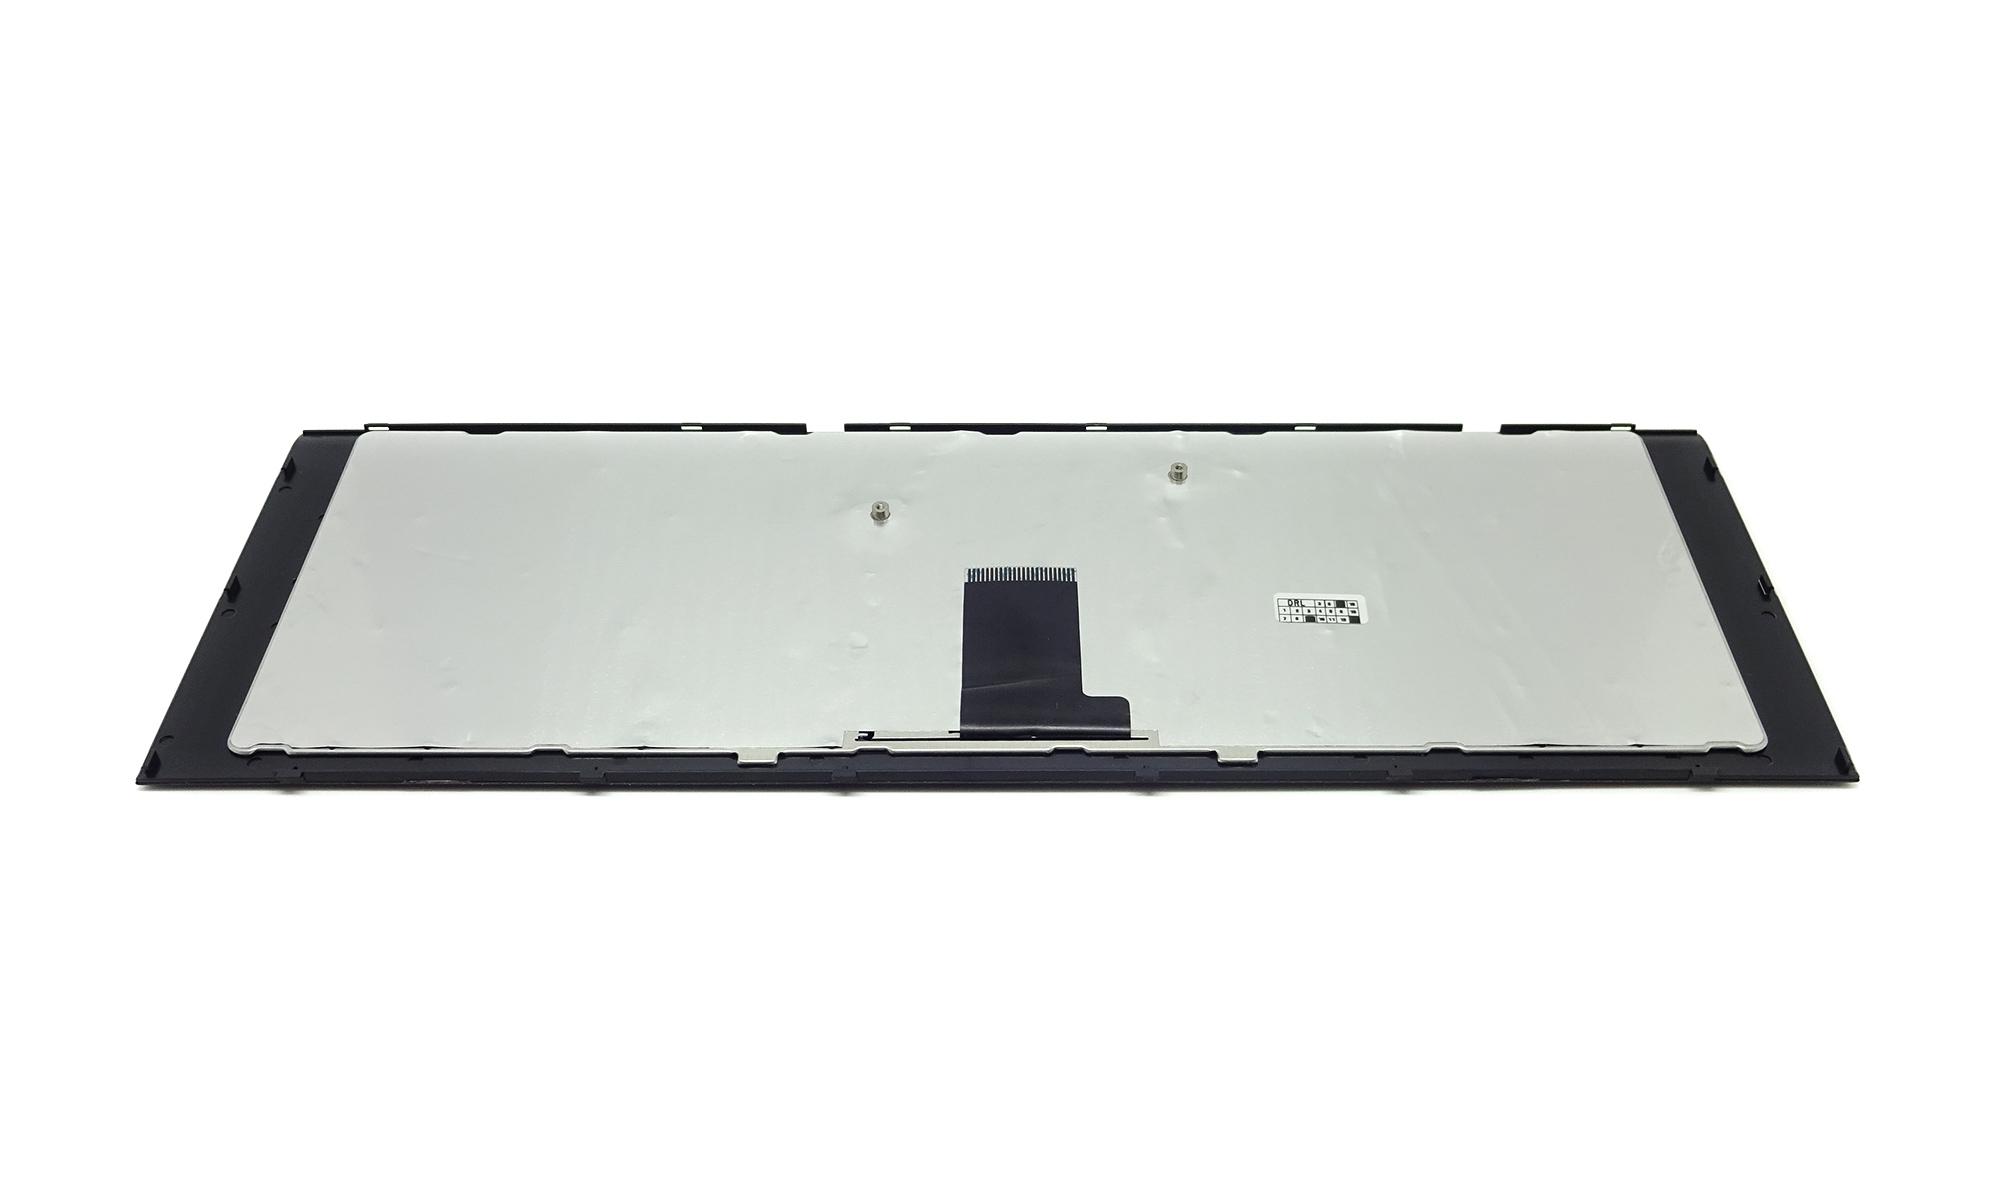 Tastatura compatibila Sony Vaio VPCEG, VPC-EG, neagra, versiune US